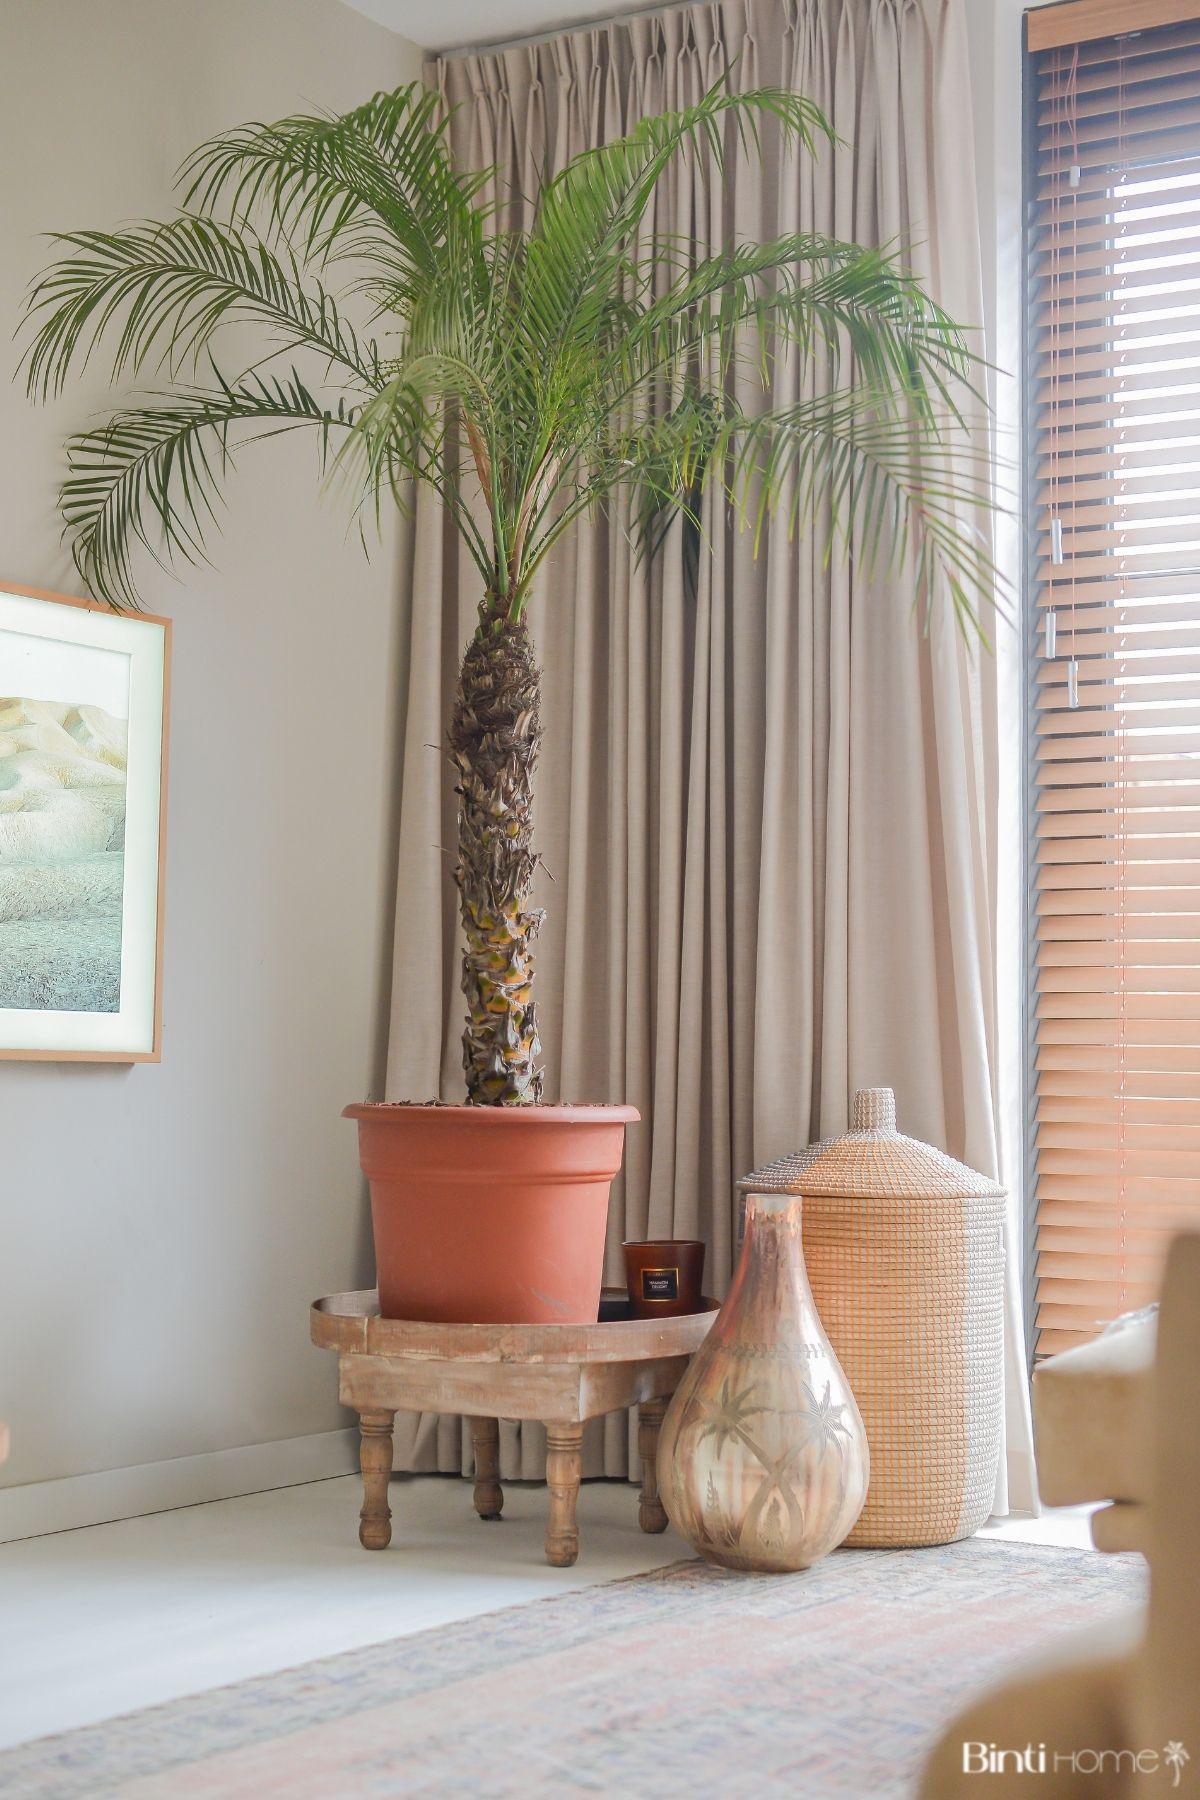 Phoenix Roeblelini palmboom als kamerplant in huis